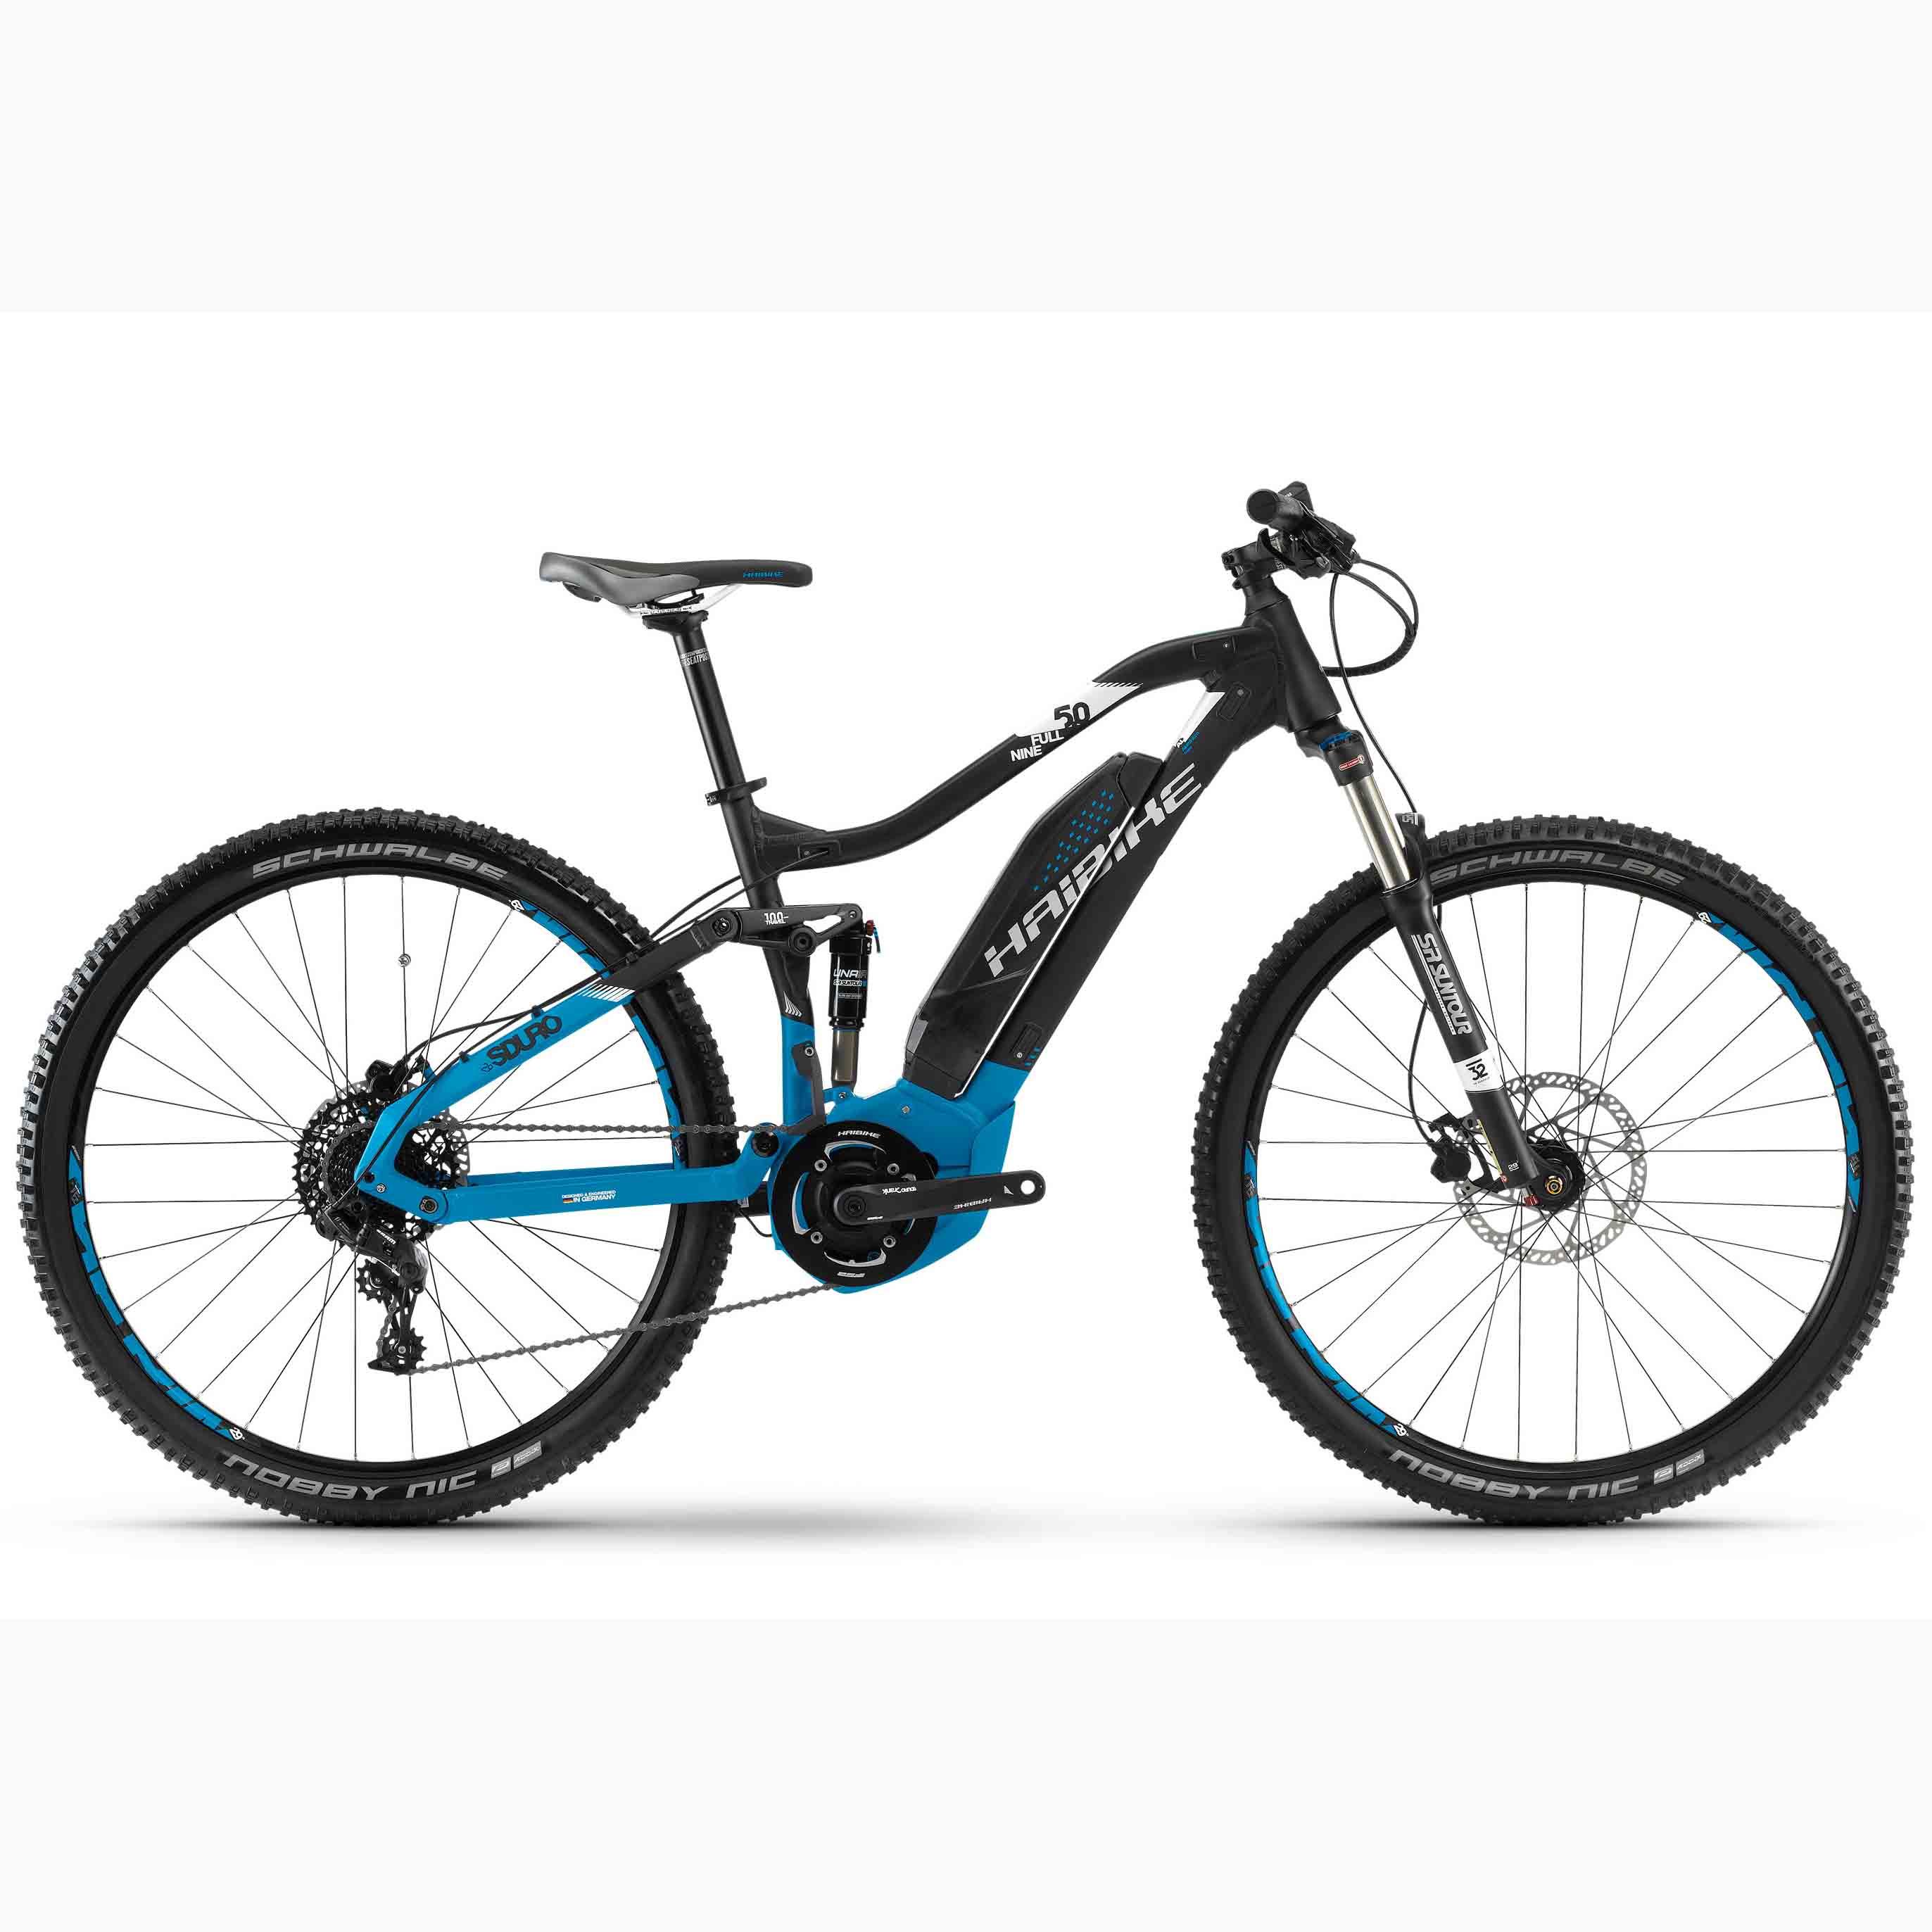 Фото Велосипед Haibike SDURO FullNine 5.0 29″ 400Wh, рама 48см, ход:100мм, 2018